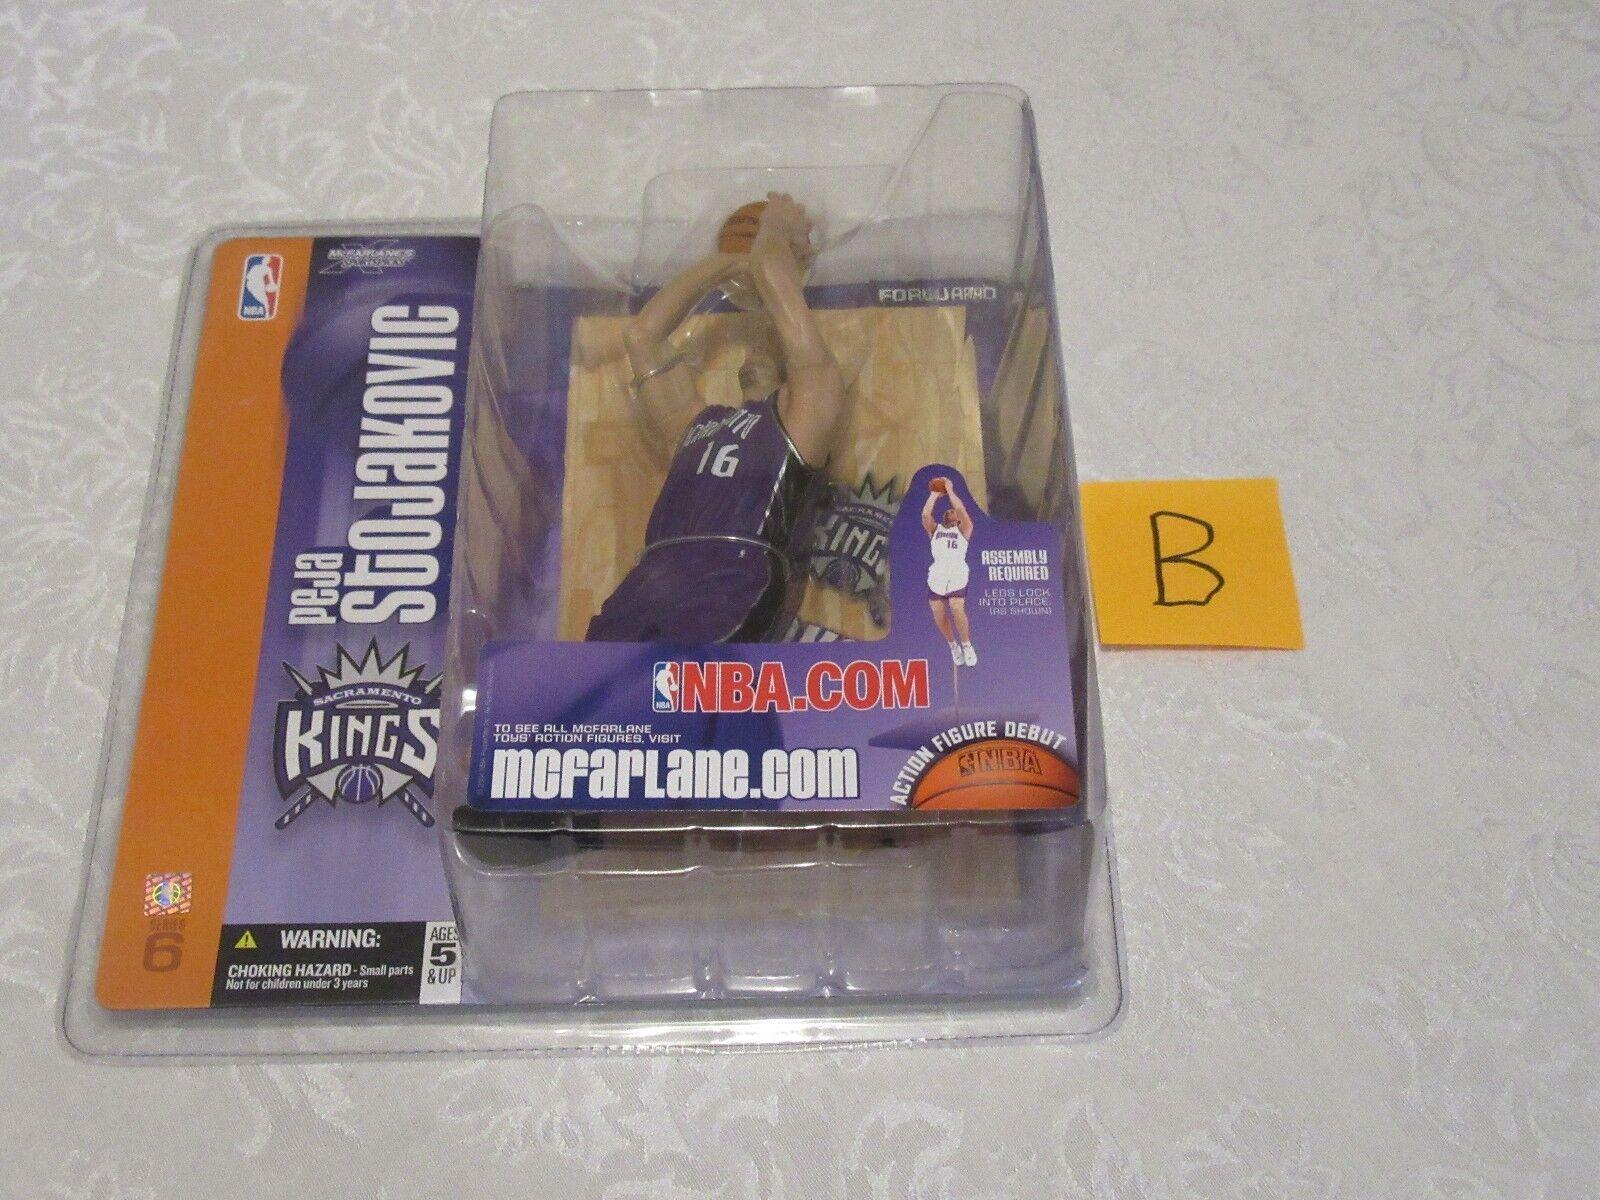 McFarlane NBA Series 6 Peja Stojakovic Chase Variant Purple Jersey Kings B